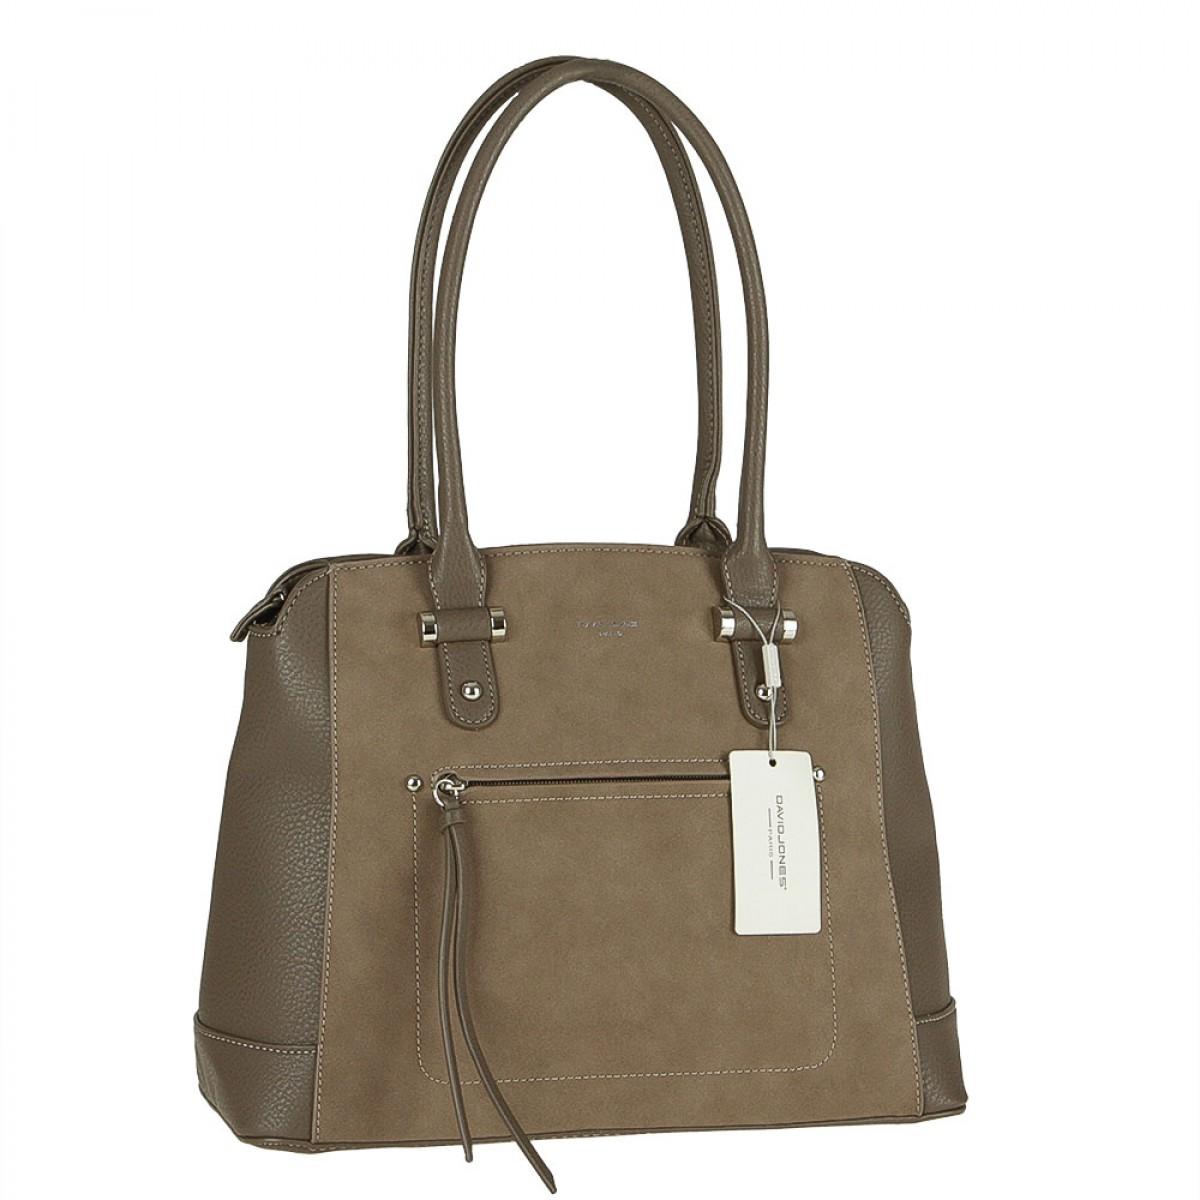 Жіноча сумка David Jones 5556A-1 D.TAUPE